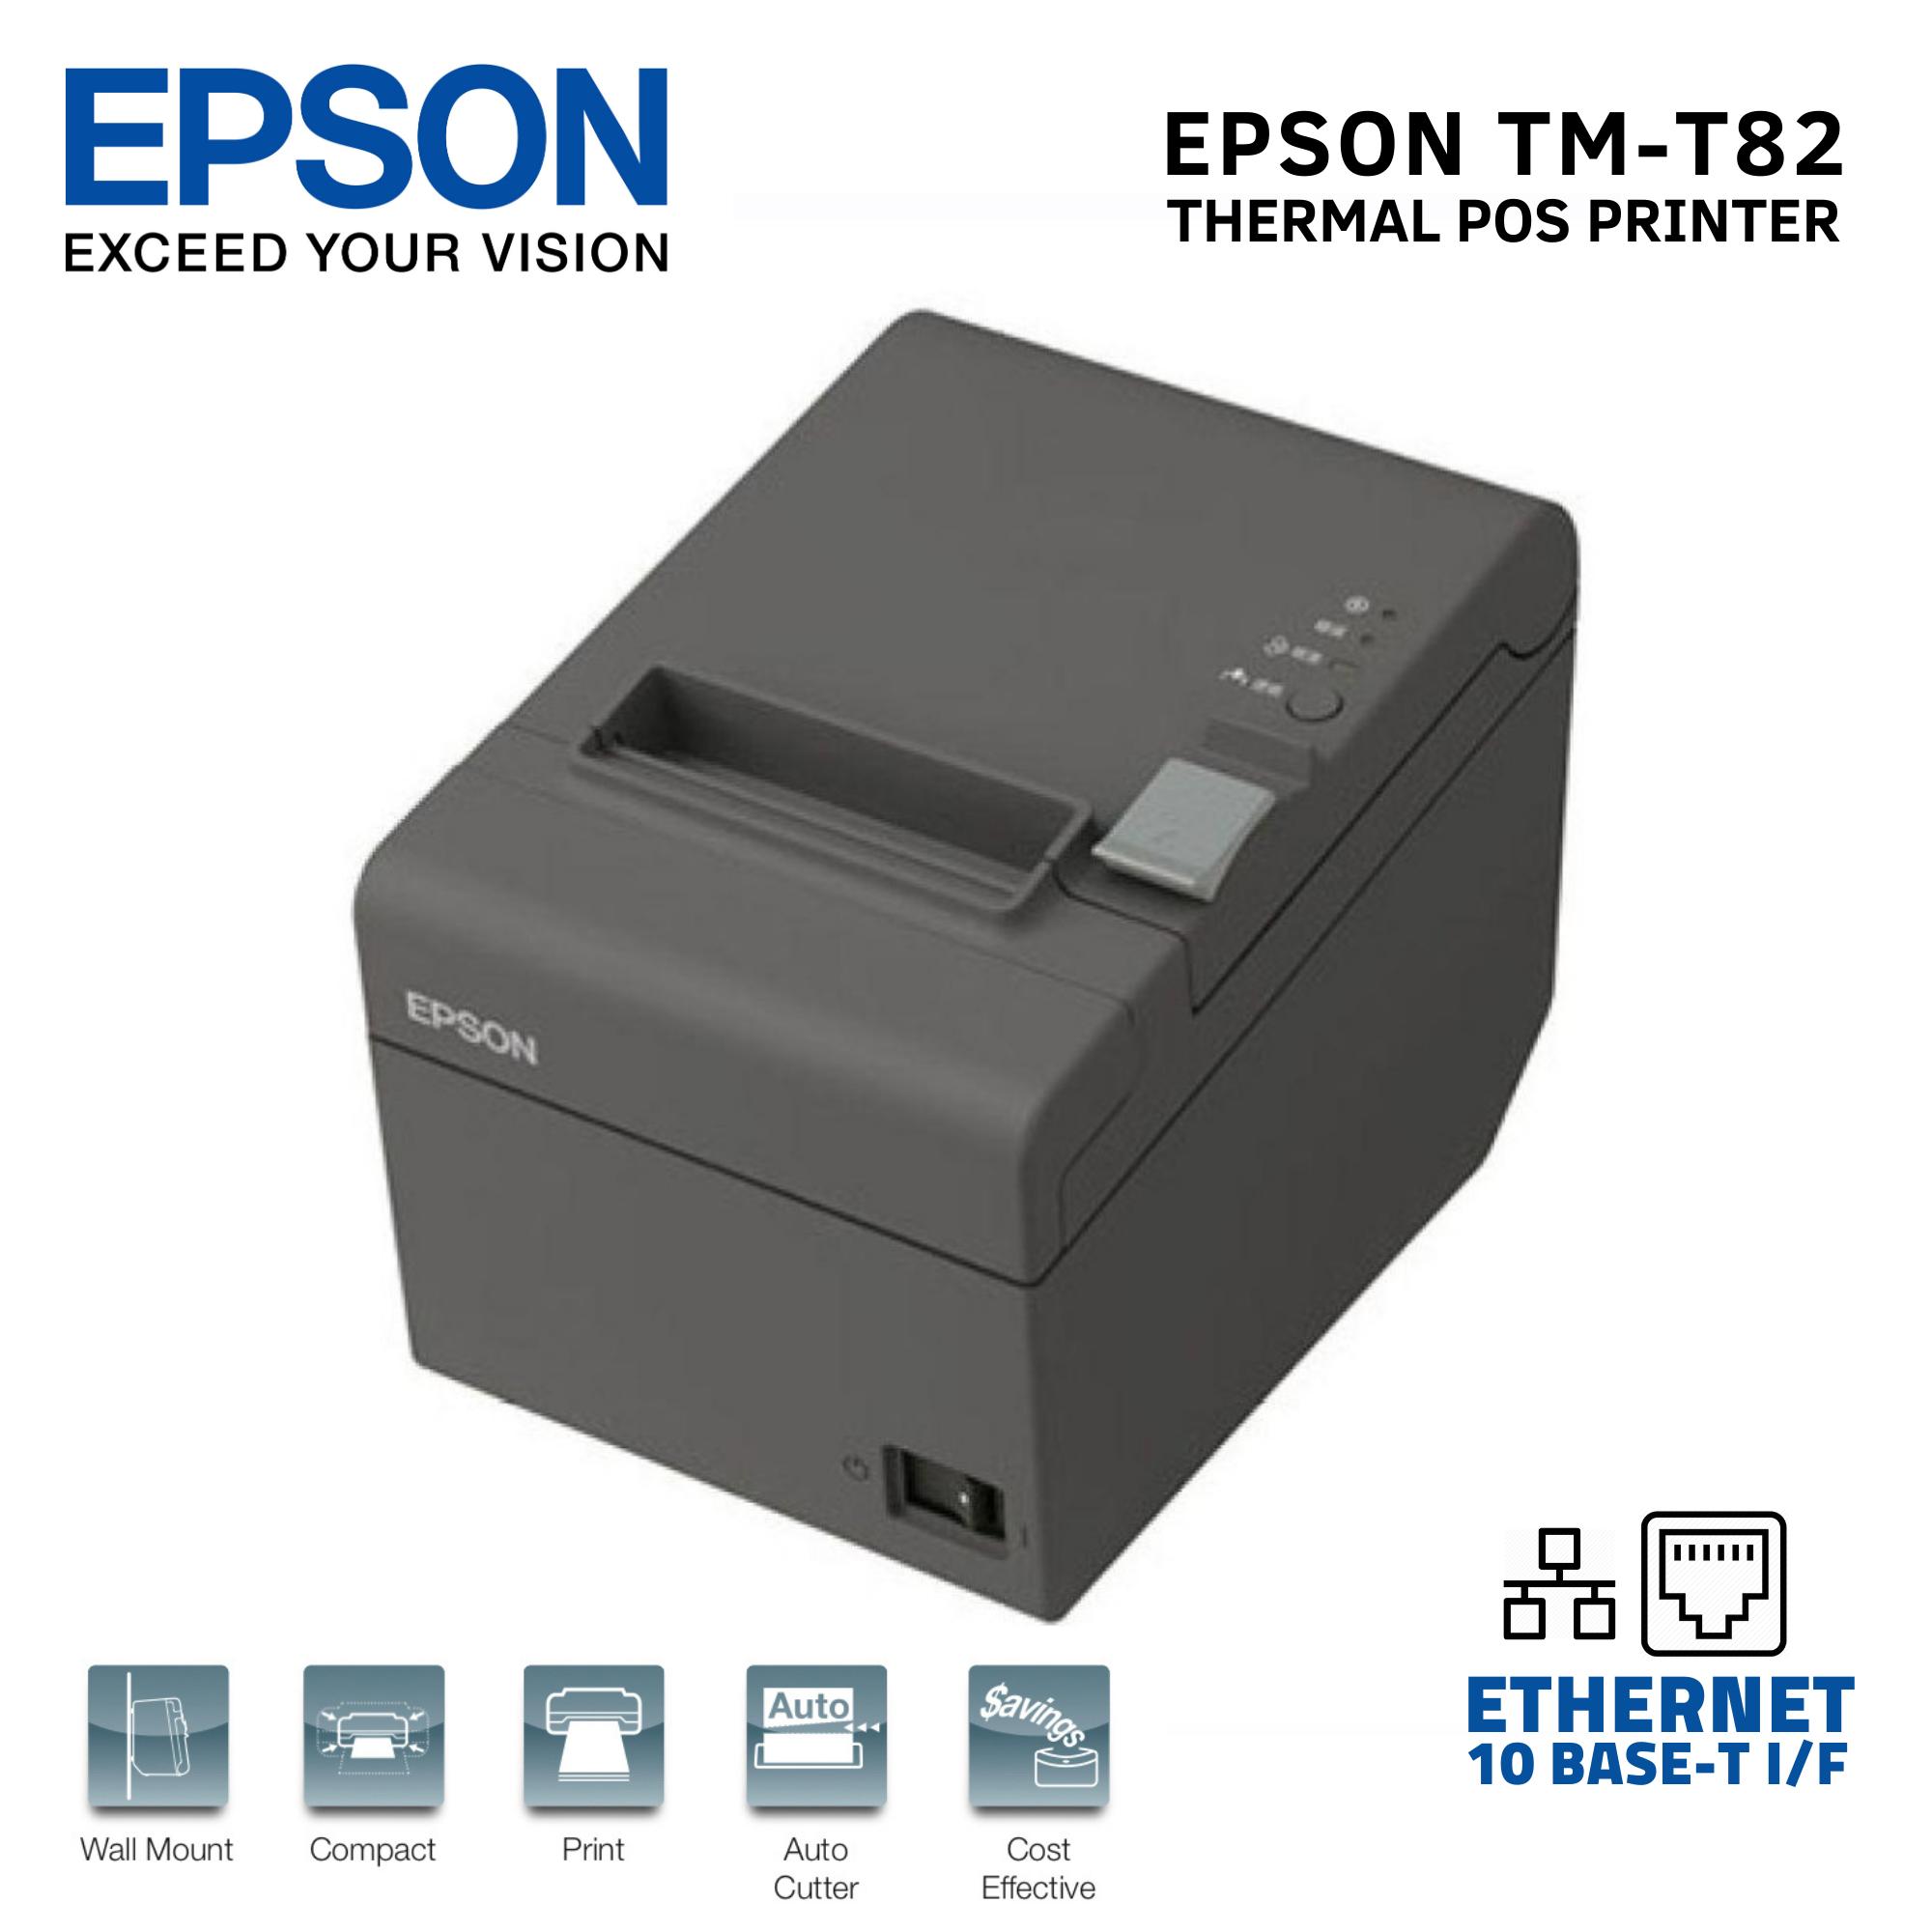 Epson Tm T82 Thermal Pos Receipt Printer Usb Ethernet 10 Base T Interface Lazada Ph